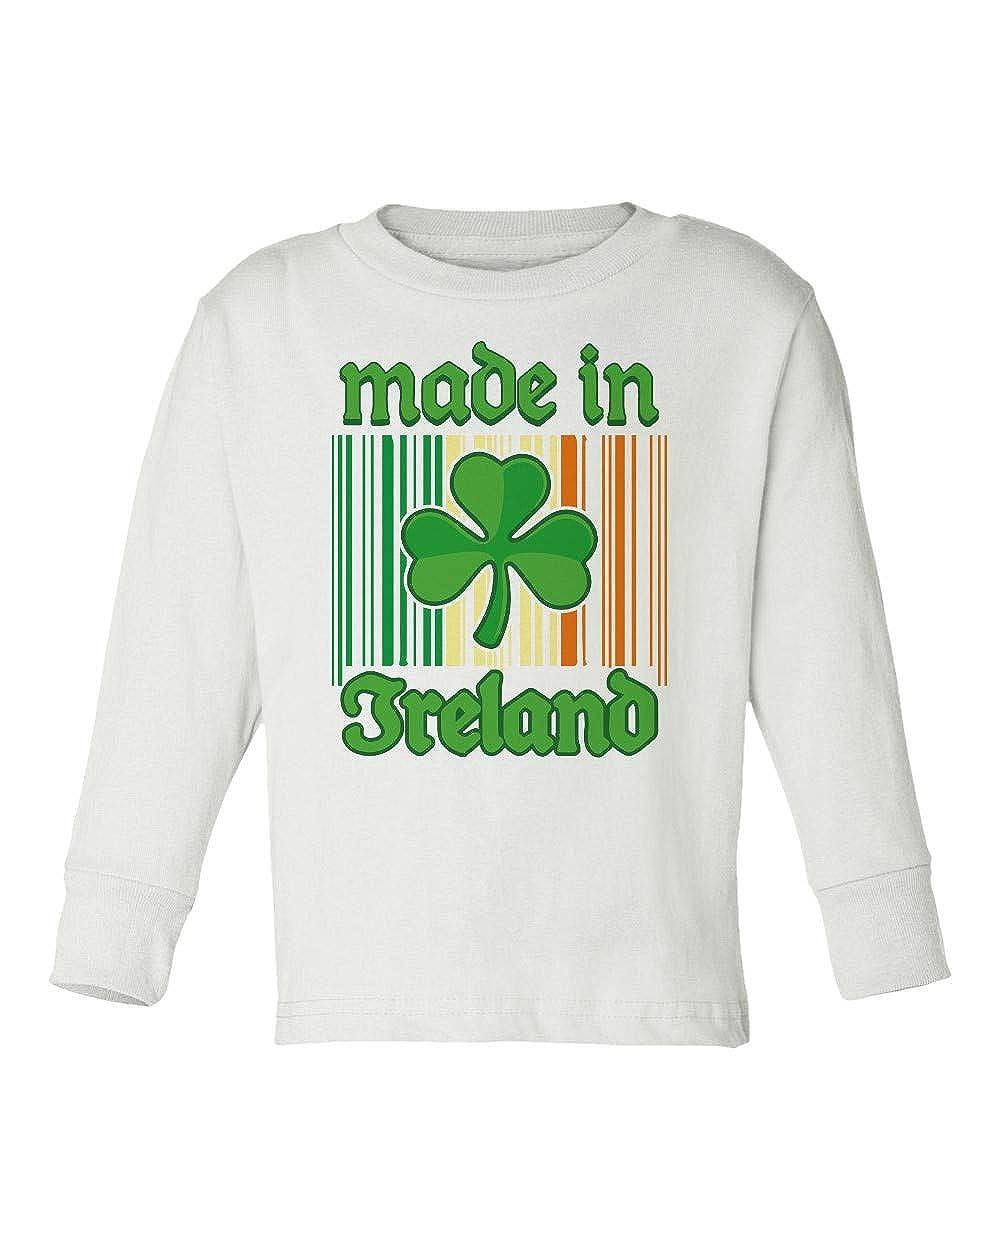 Societee Made in Ireland Barcode Clover St Patricks Day Girls Boys Toddler Long Sleeve T-Shirt